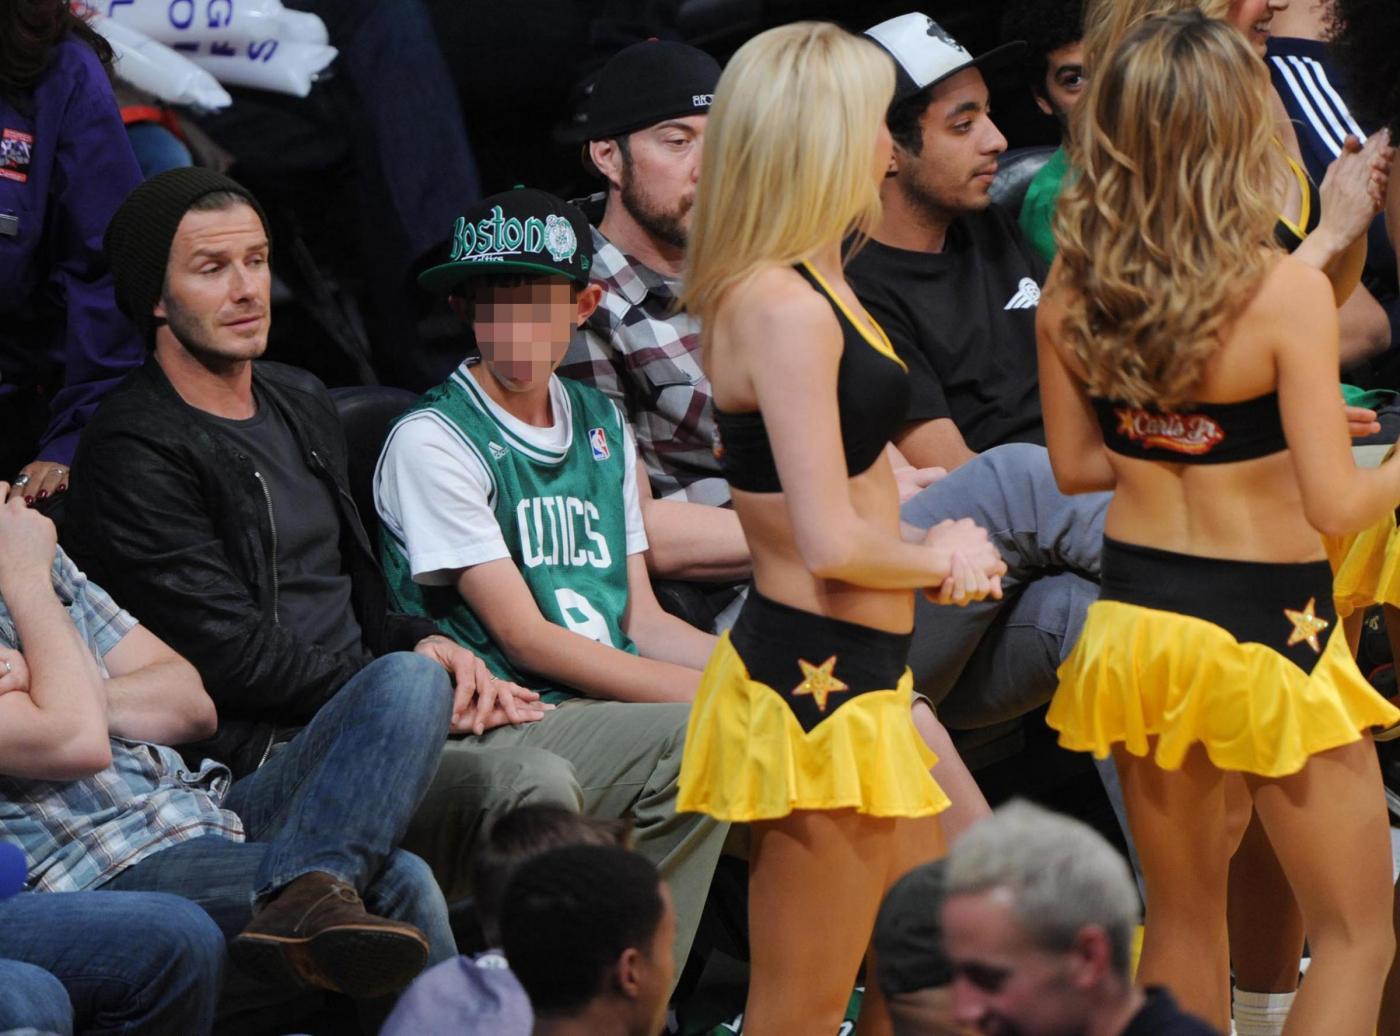 David Beckham alla partita Los Angeles Lakers vs. Boston Celtics04